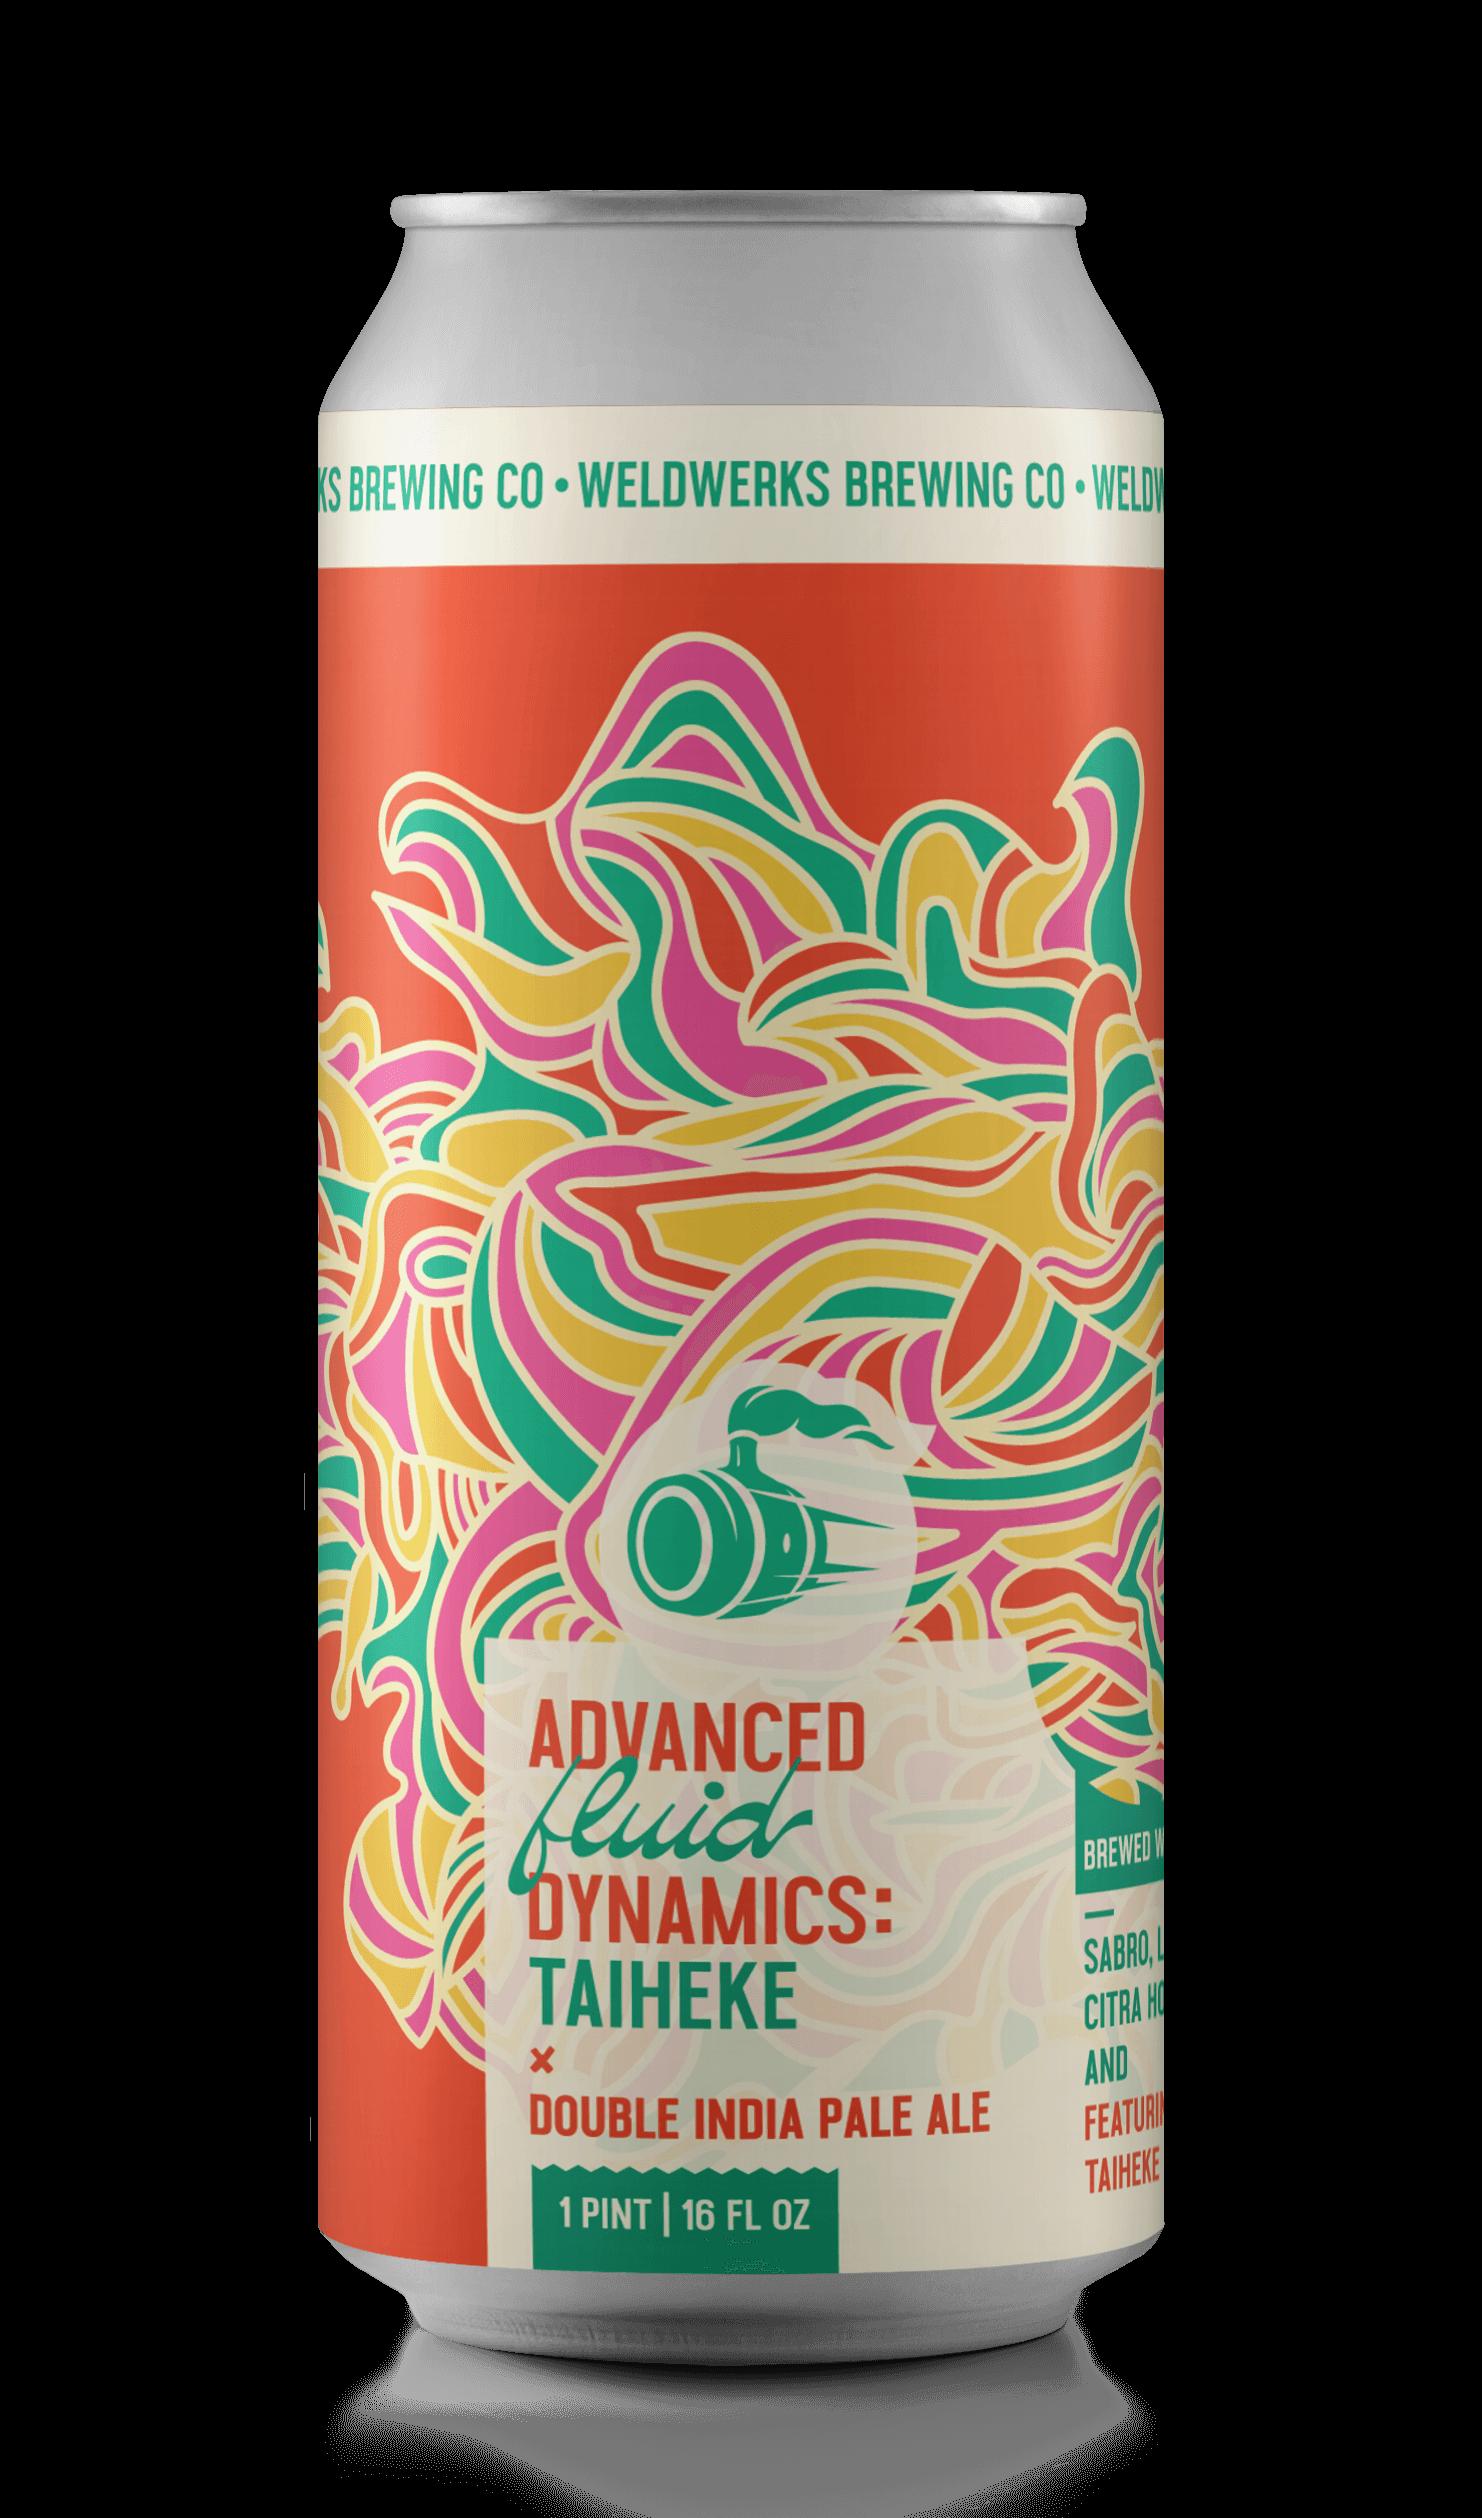 Advanced Fluid Dynamics: Taiheke